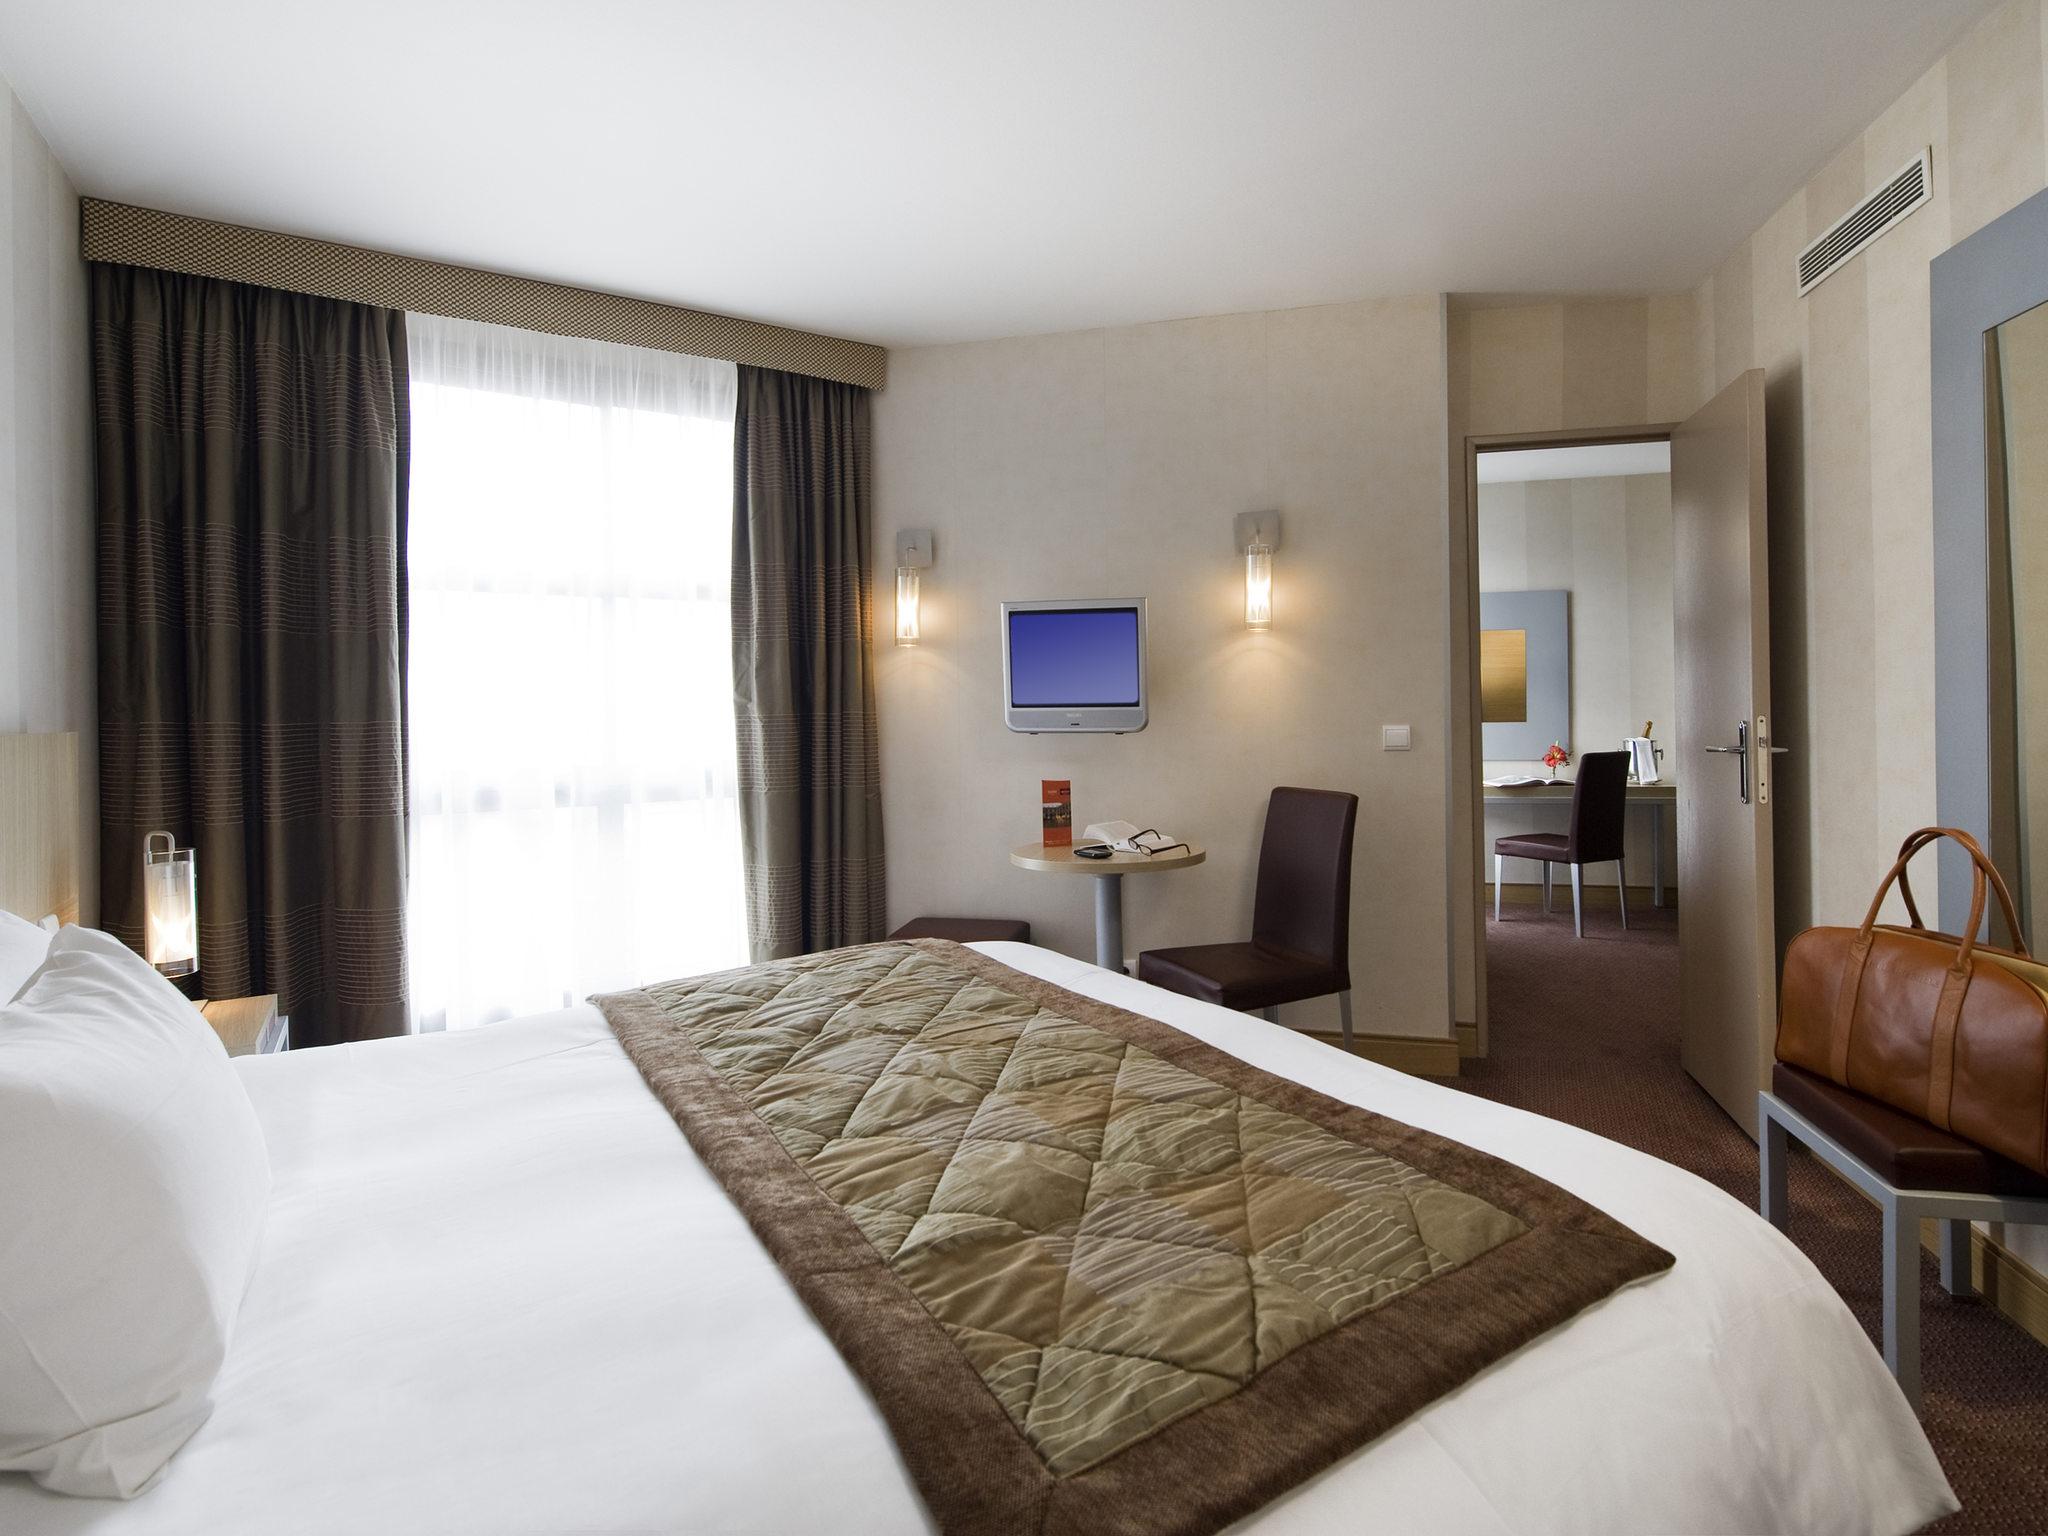 فندق - مركيور Mercure باريس جوبلينز بلاس ديتالى